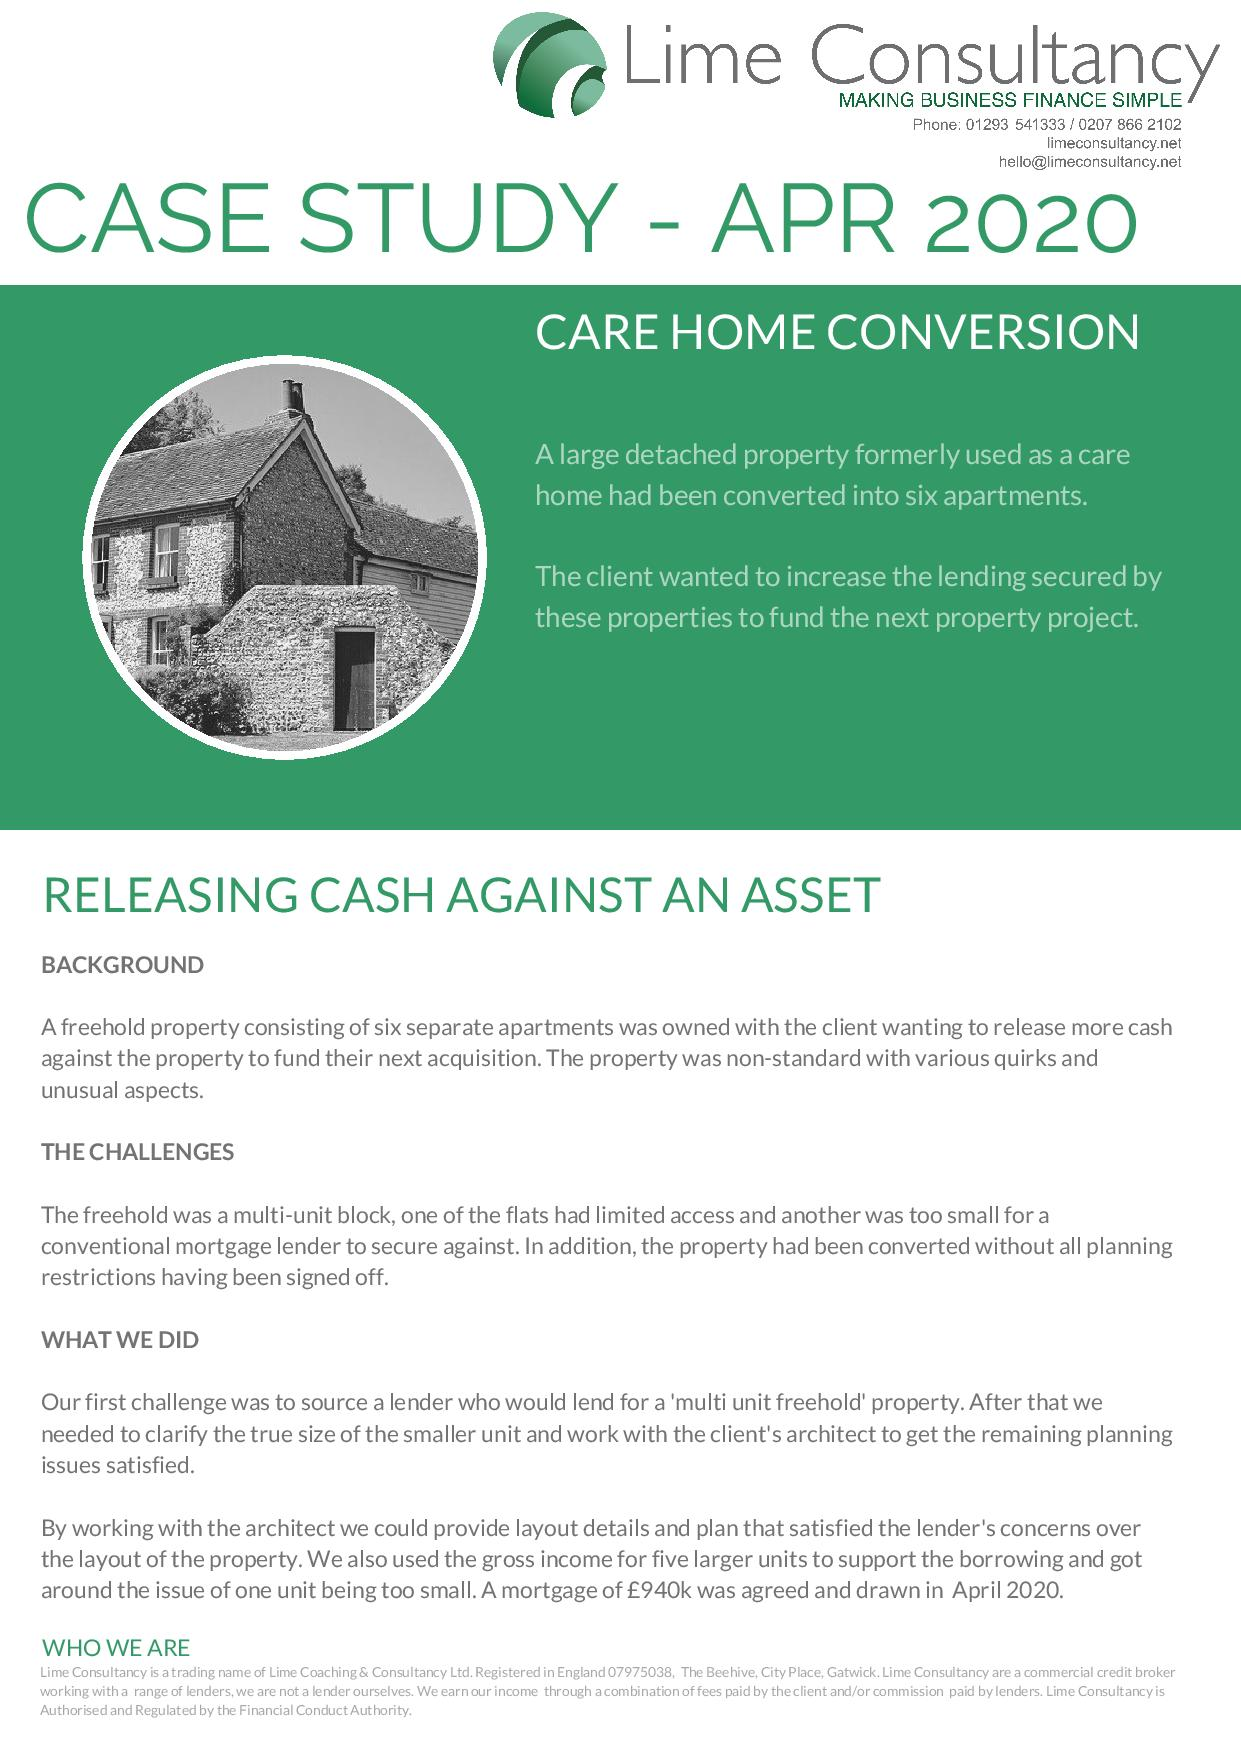 multi unit freehold block commercial mortgage April 2020